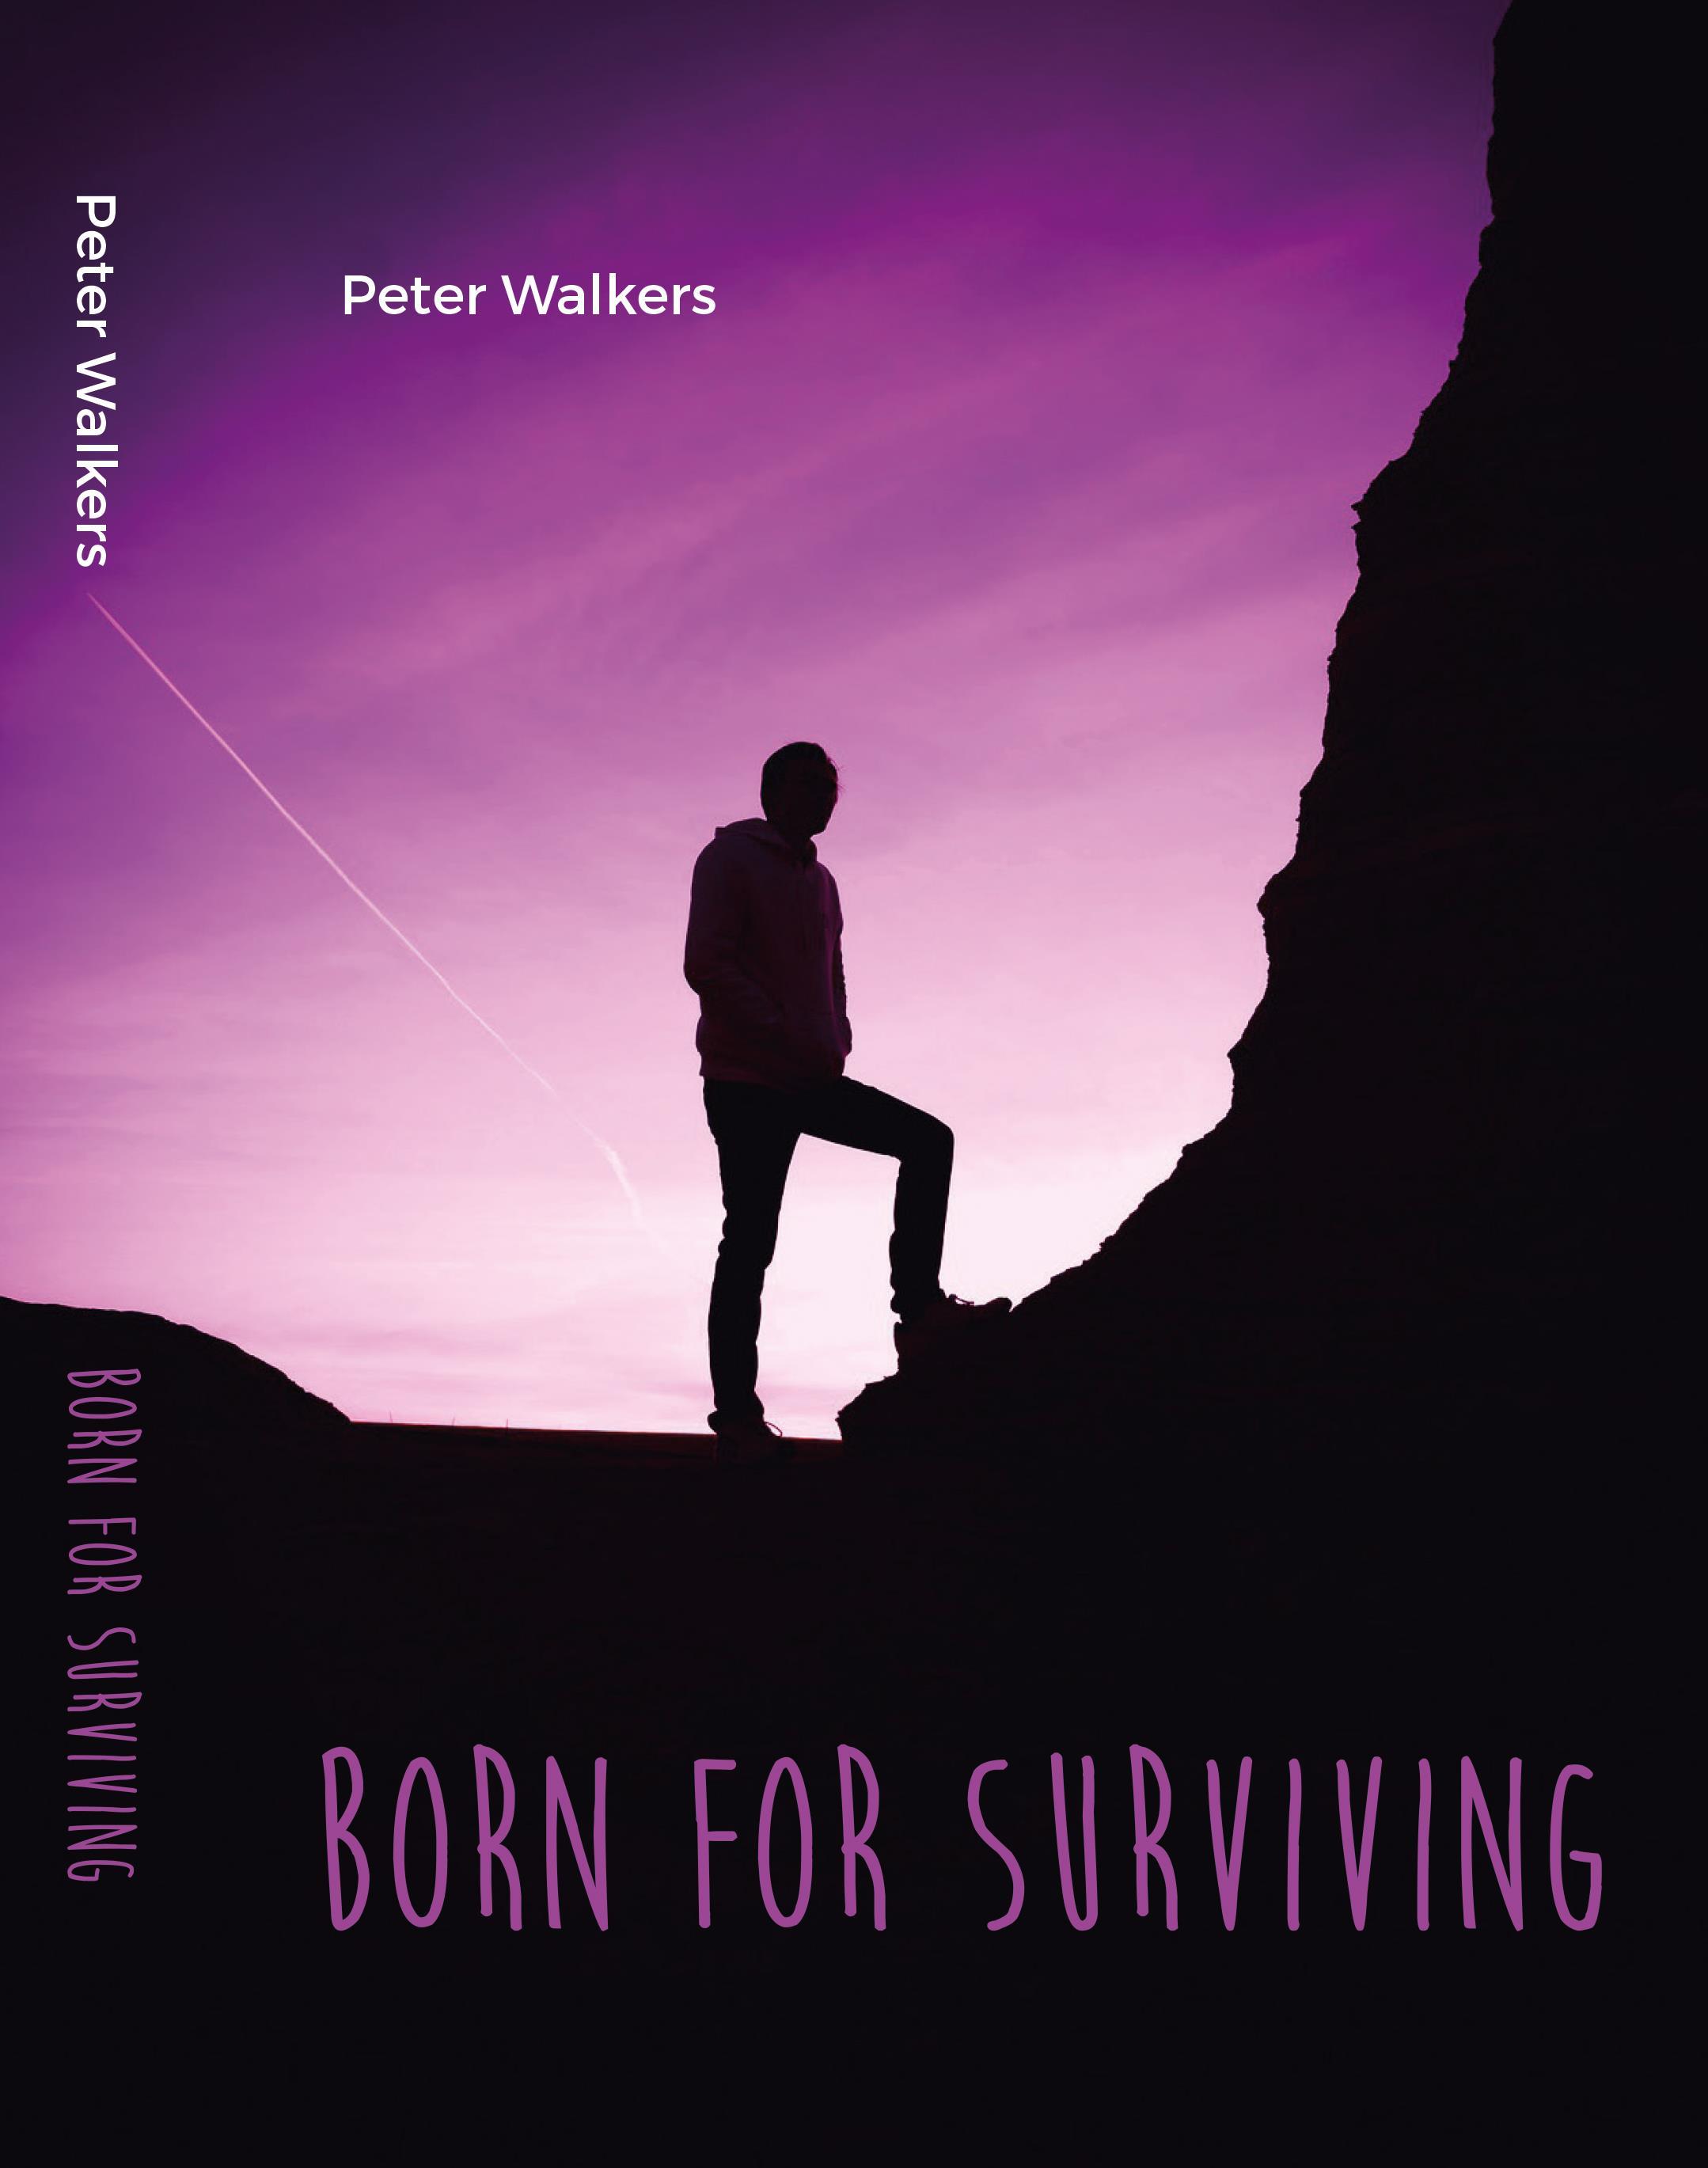 Born for surviving